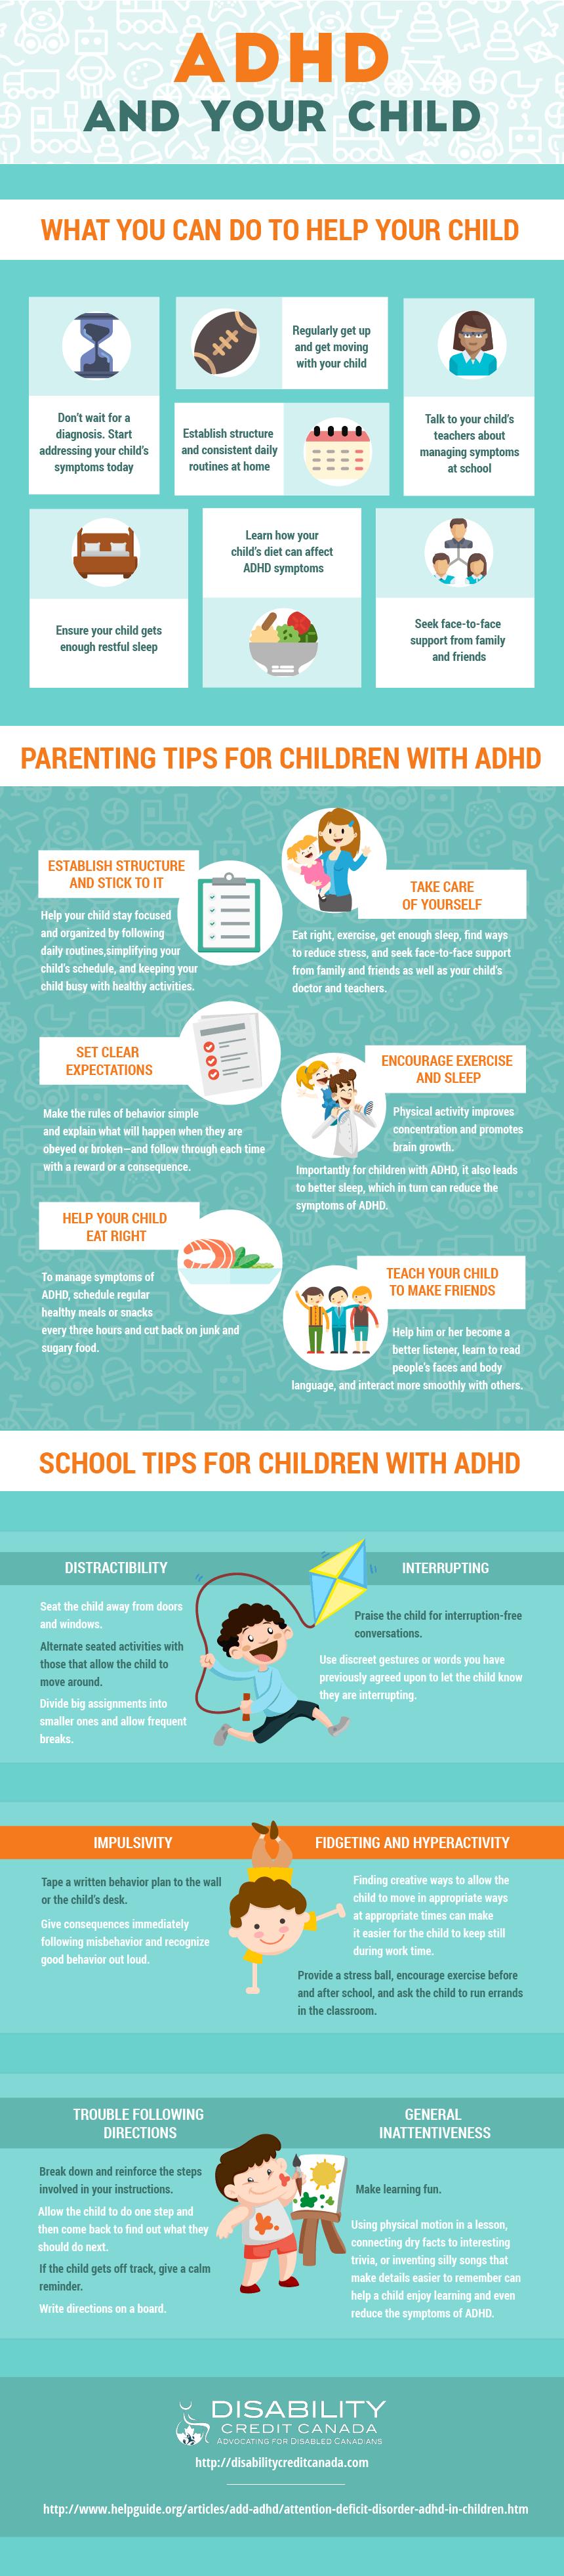 ADHD in Children Infographic